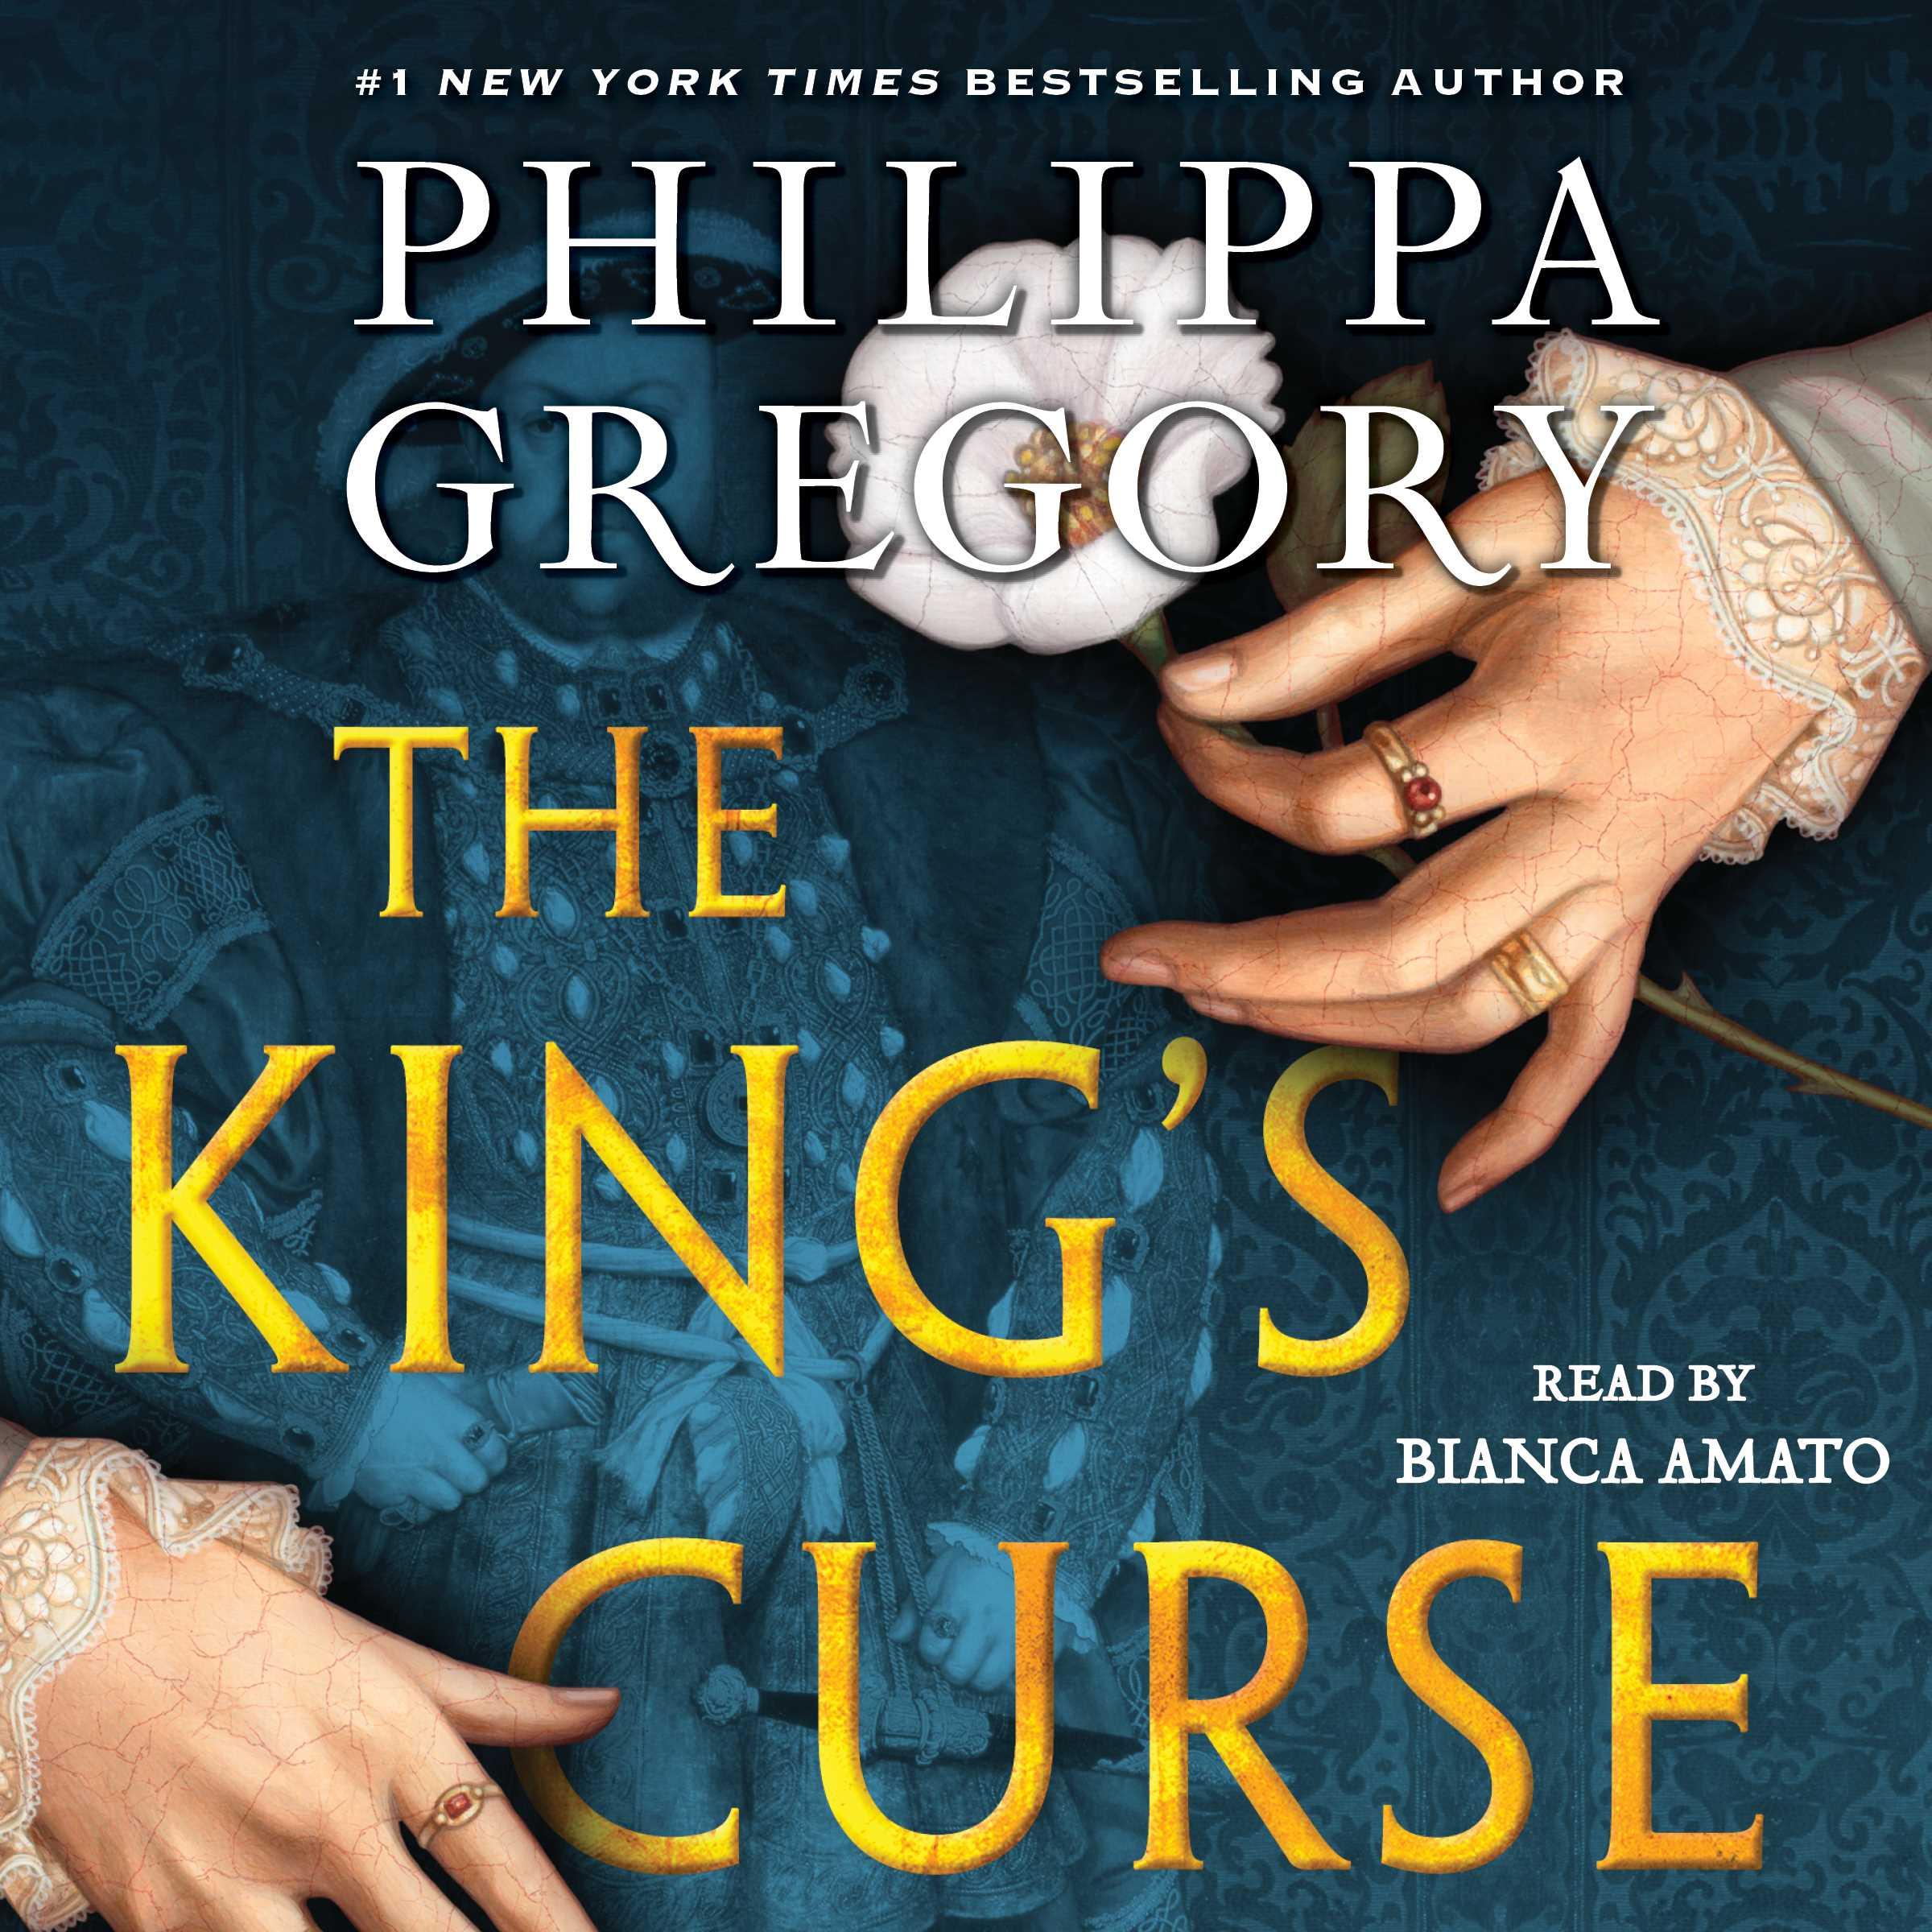 Kings curse 9781442369979 hr